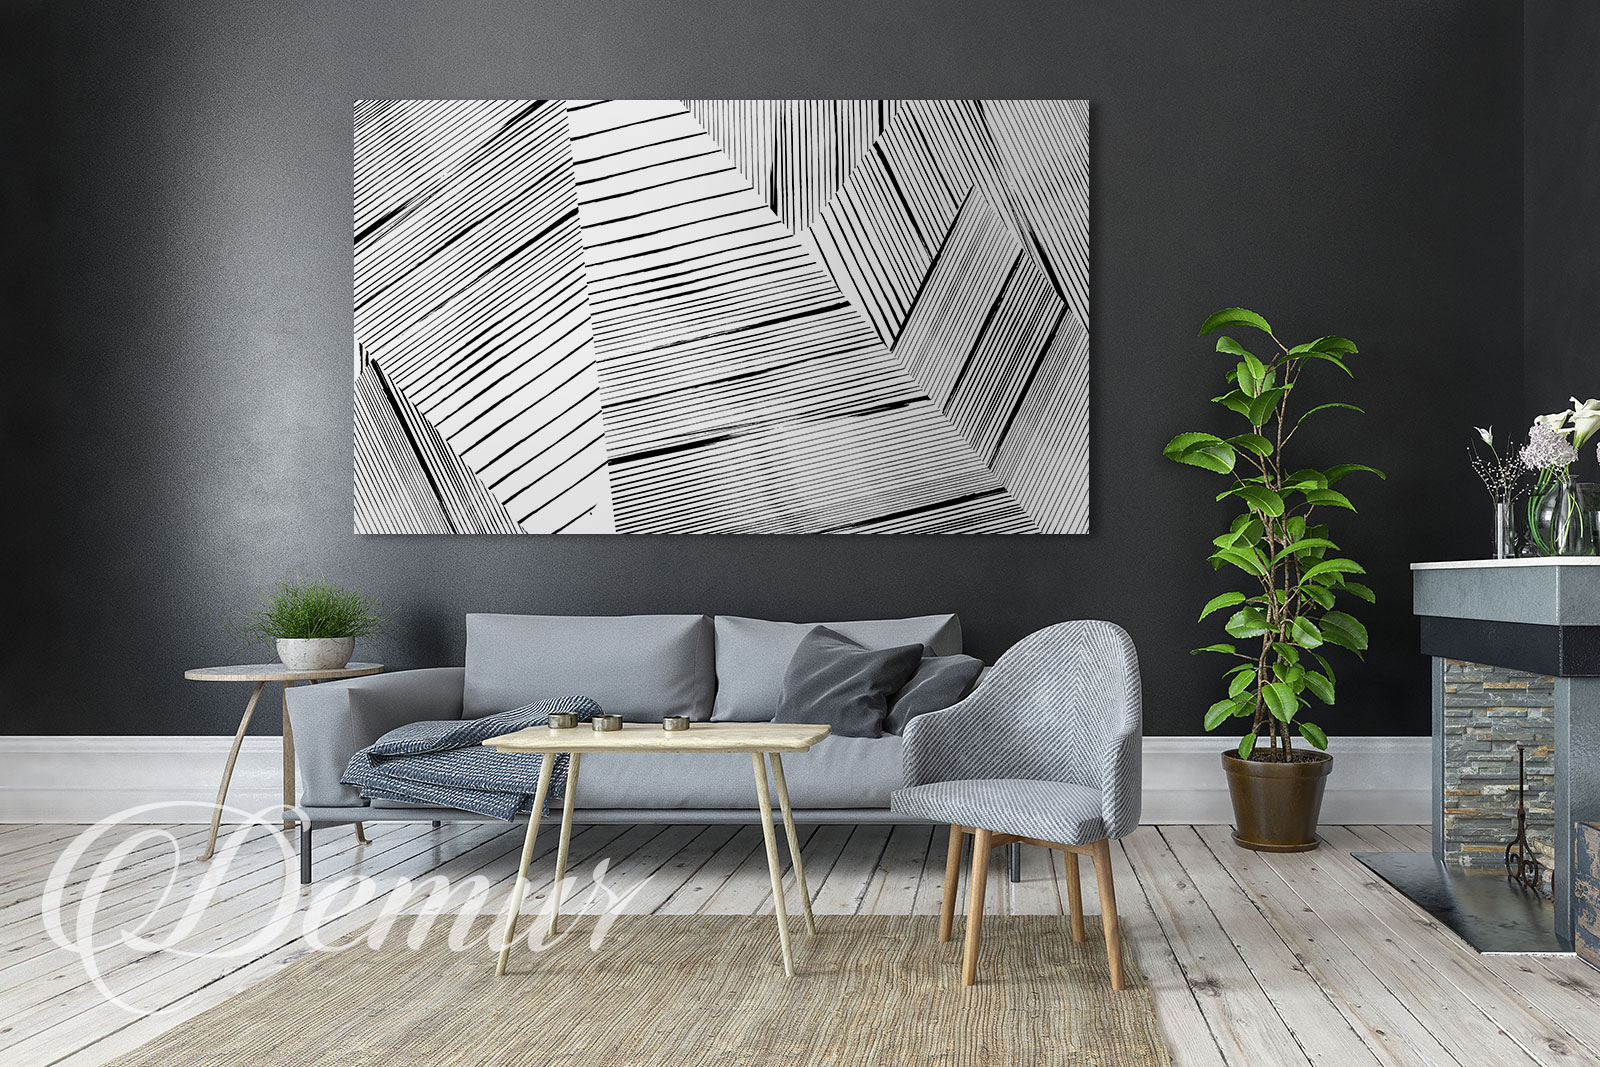 Obraz abstrakcja biało czarna - Jaki obraz do salonu - Demur